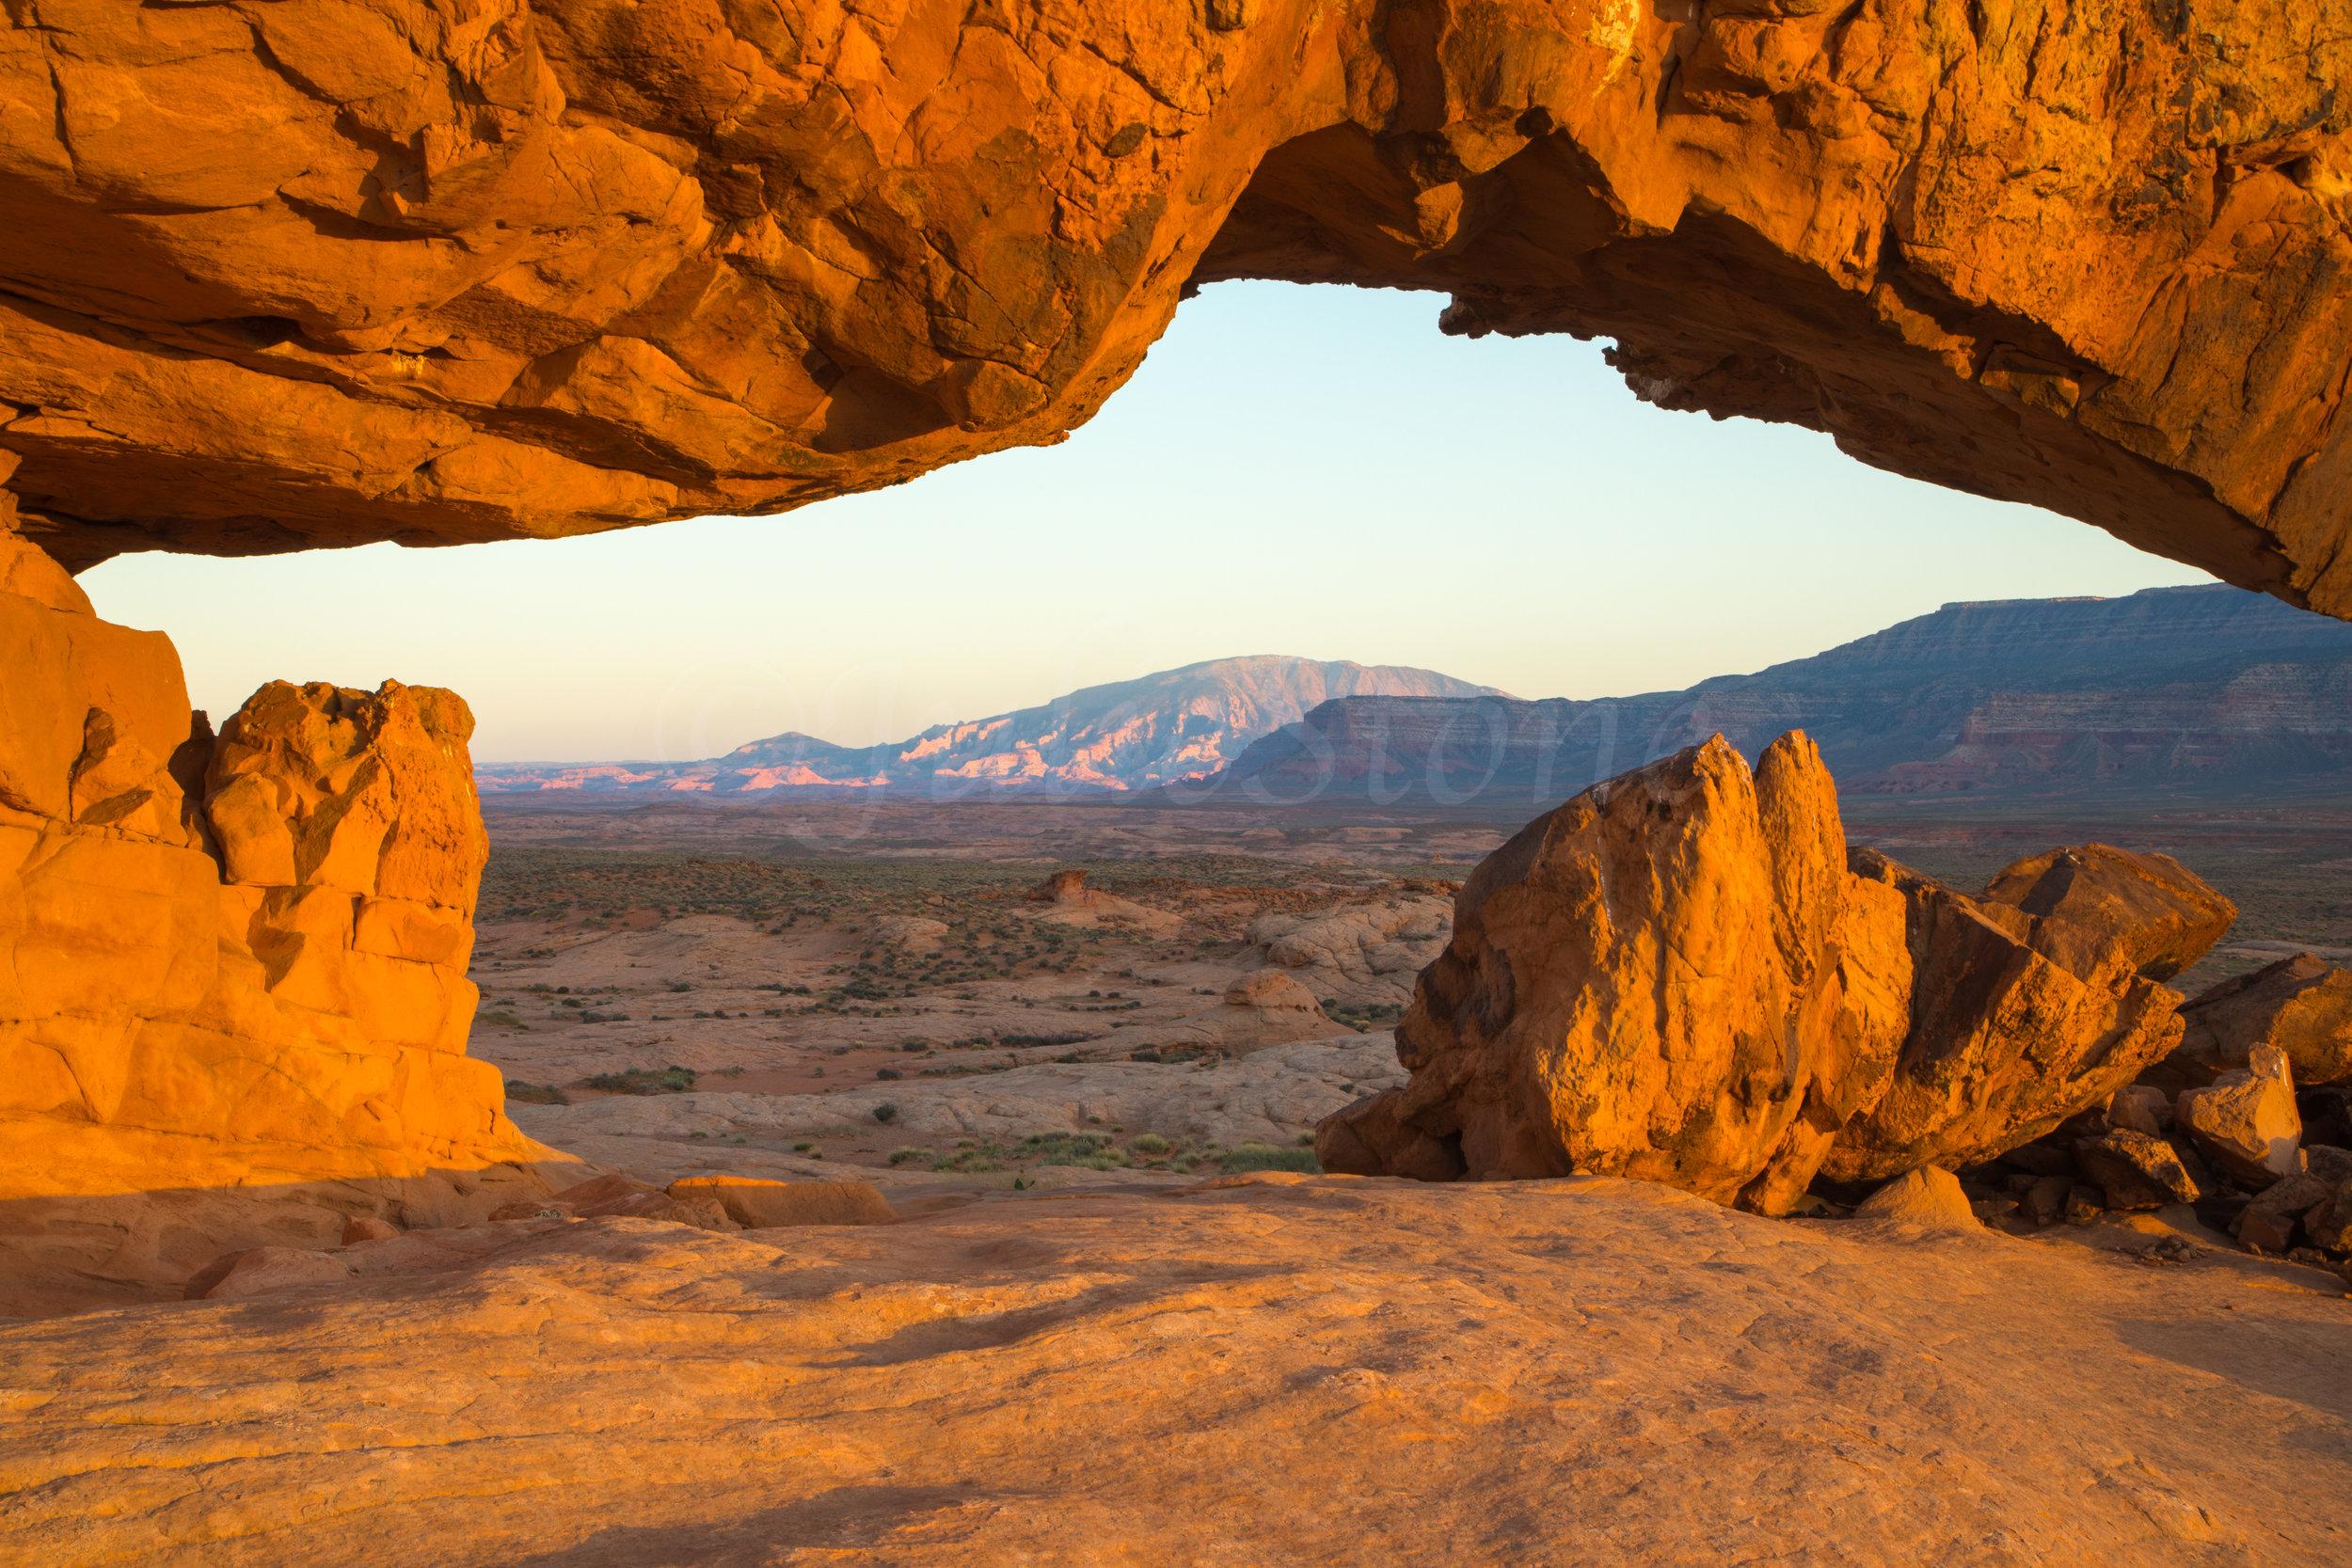 Sunset Arch, Image # 3107